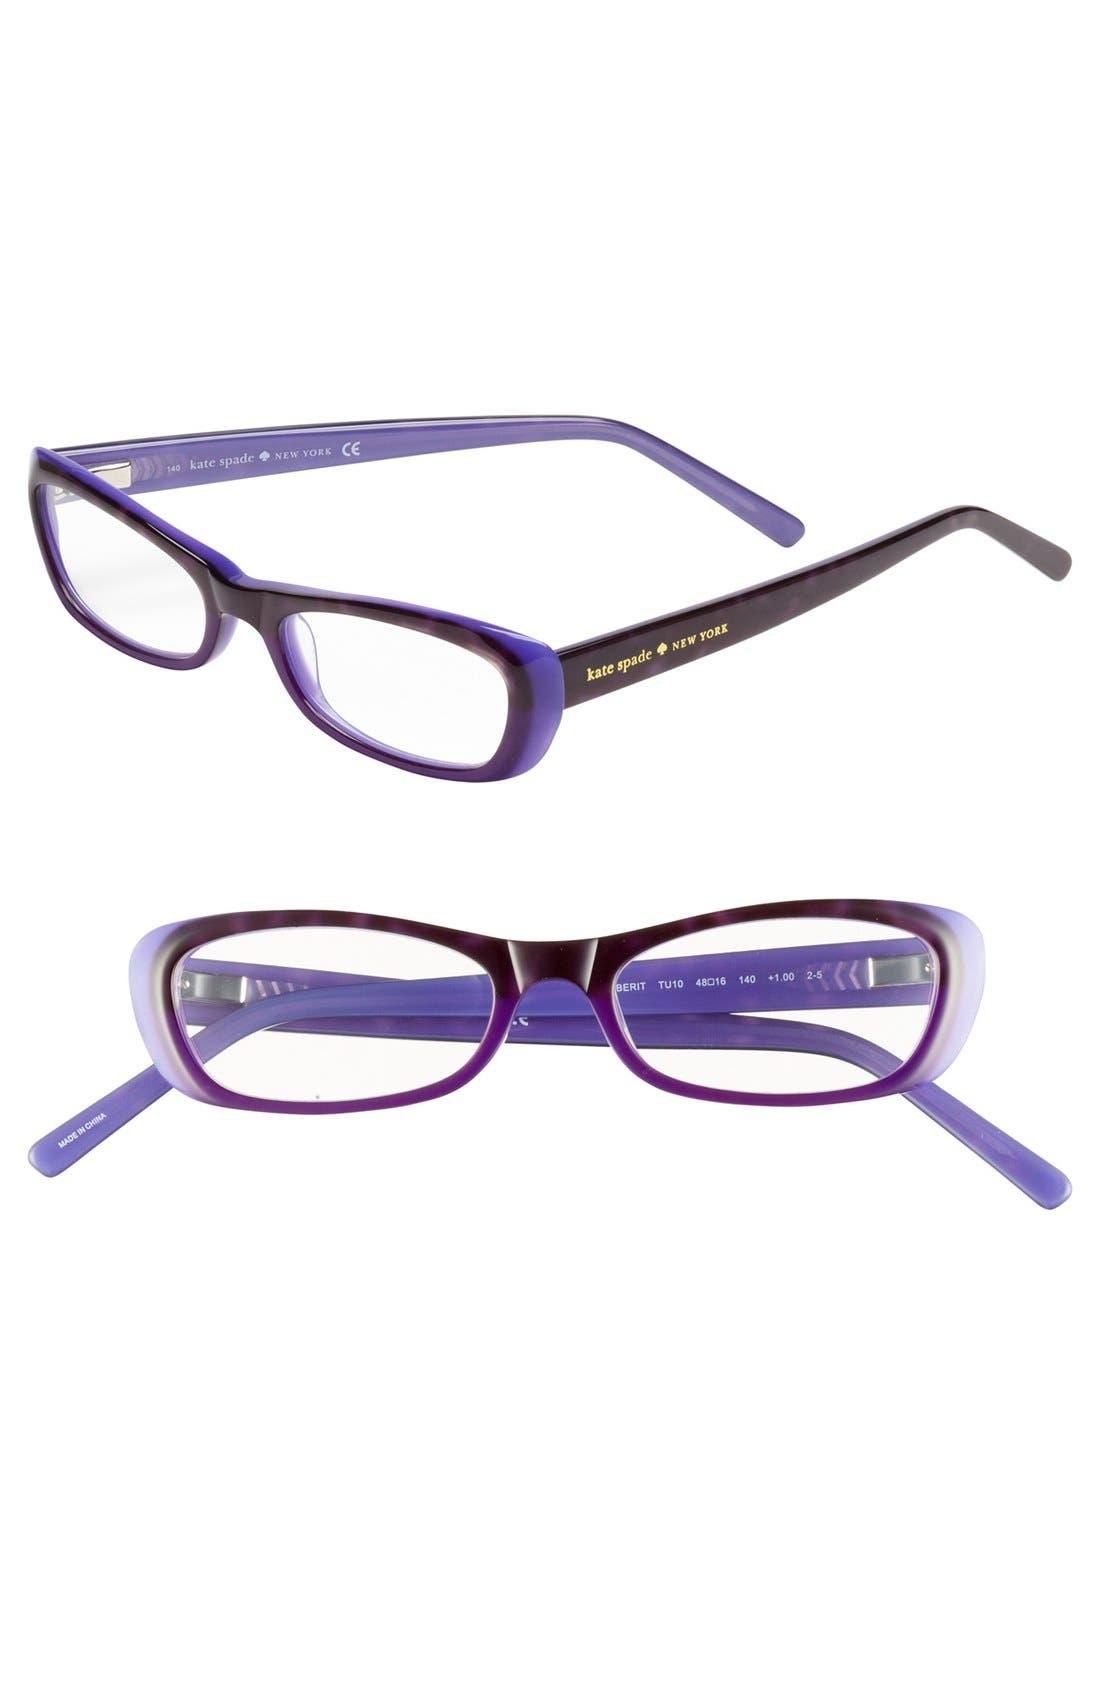 Main Image - kate spade new york 'berit' reading glasses (Online Only)